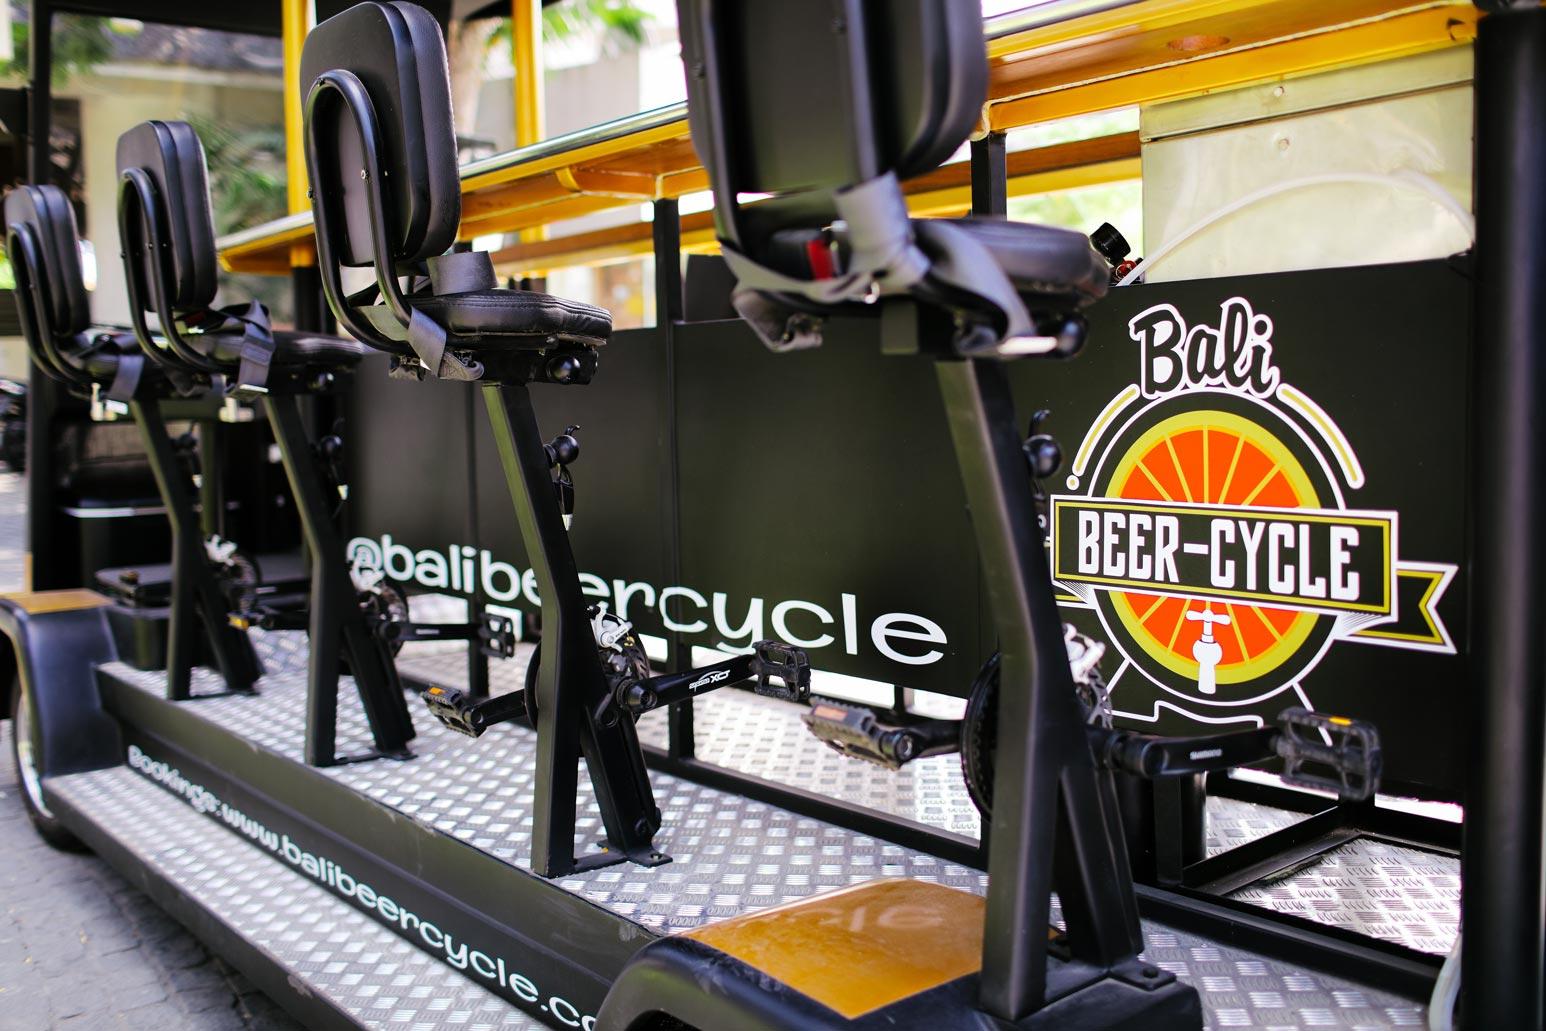 Bali Beer Cycle